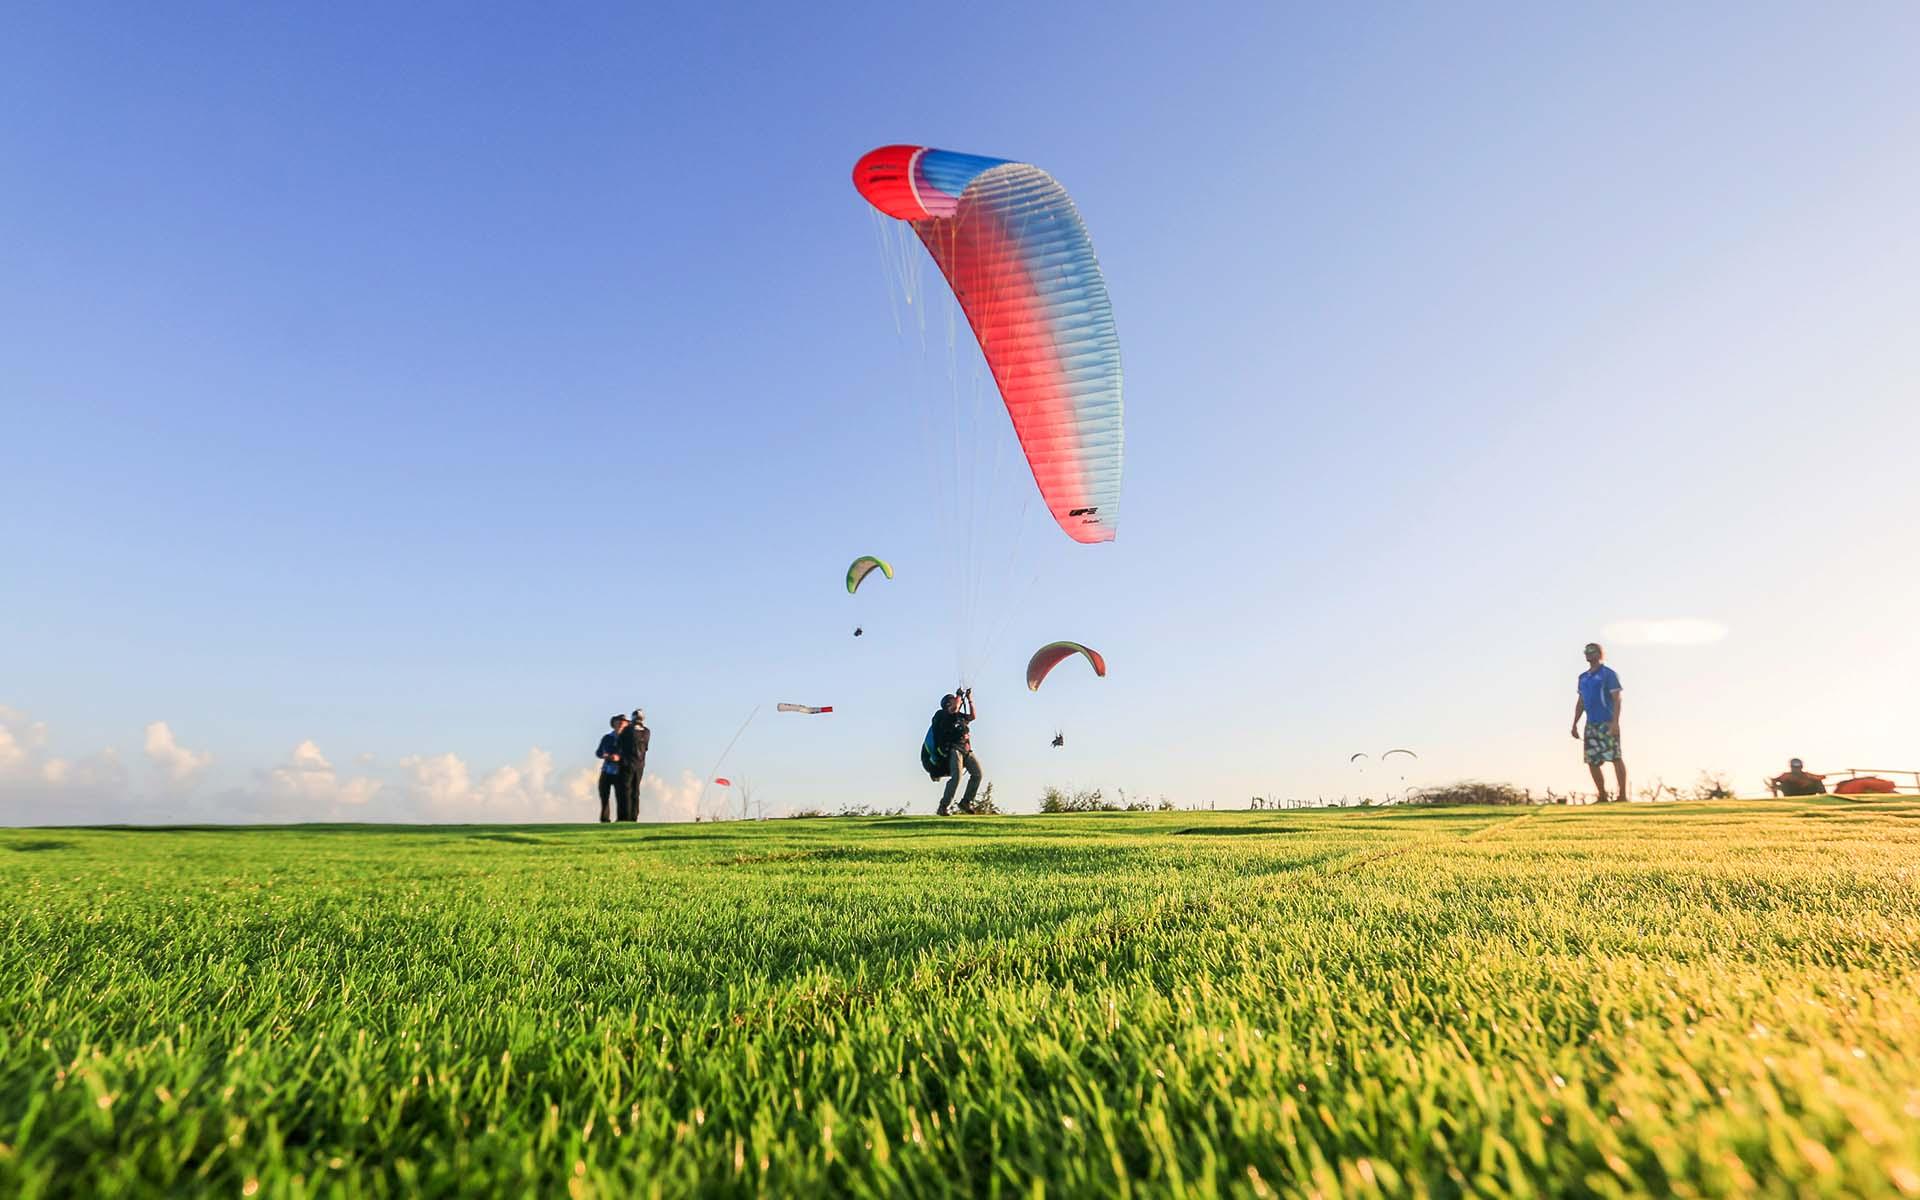 Riug Paragliding landing area